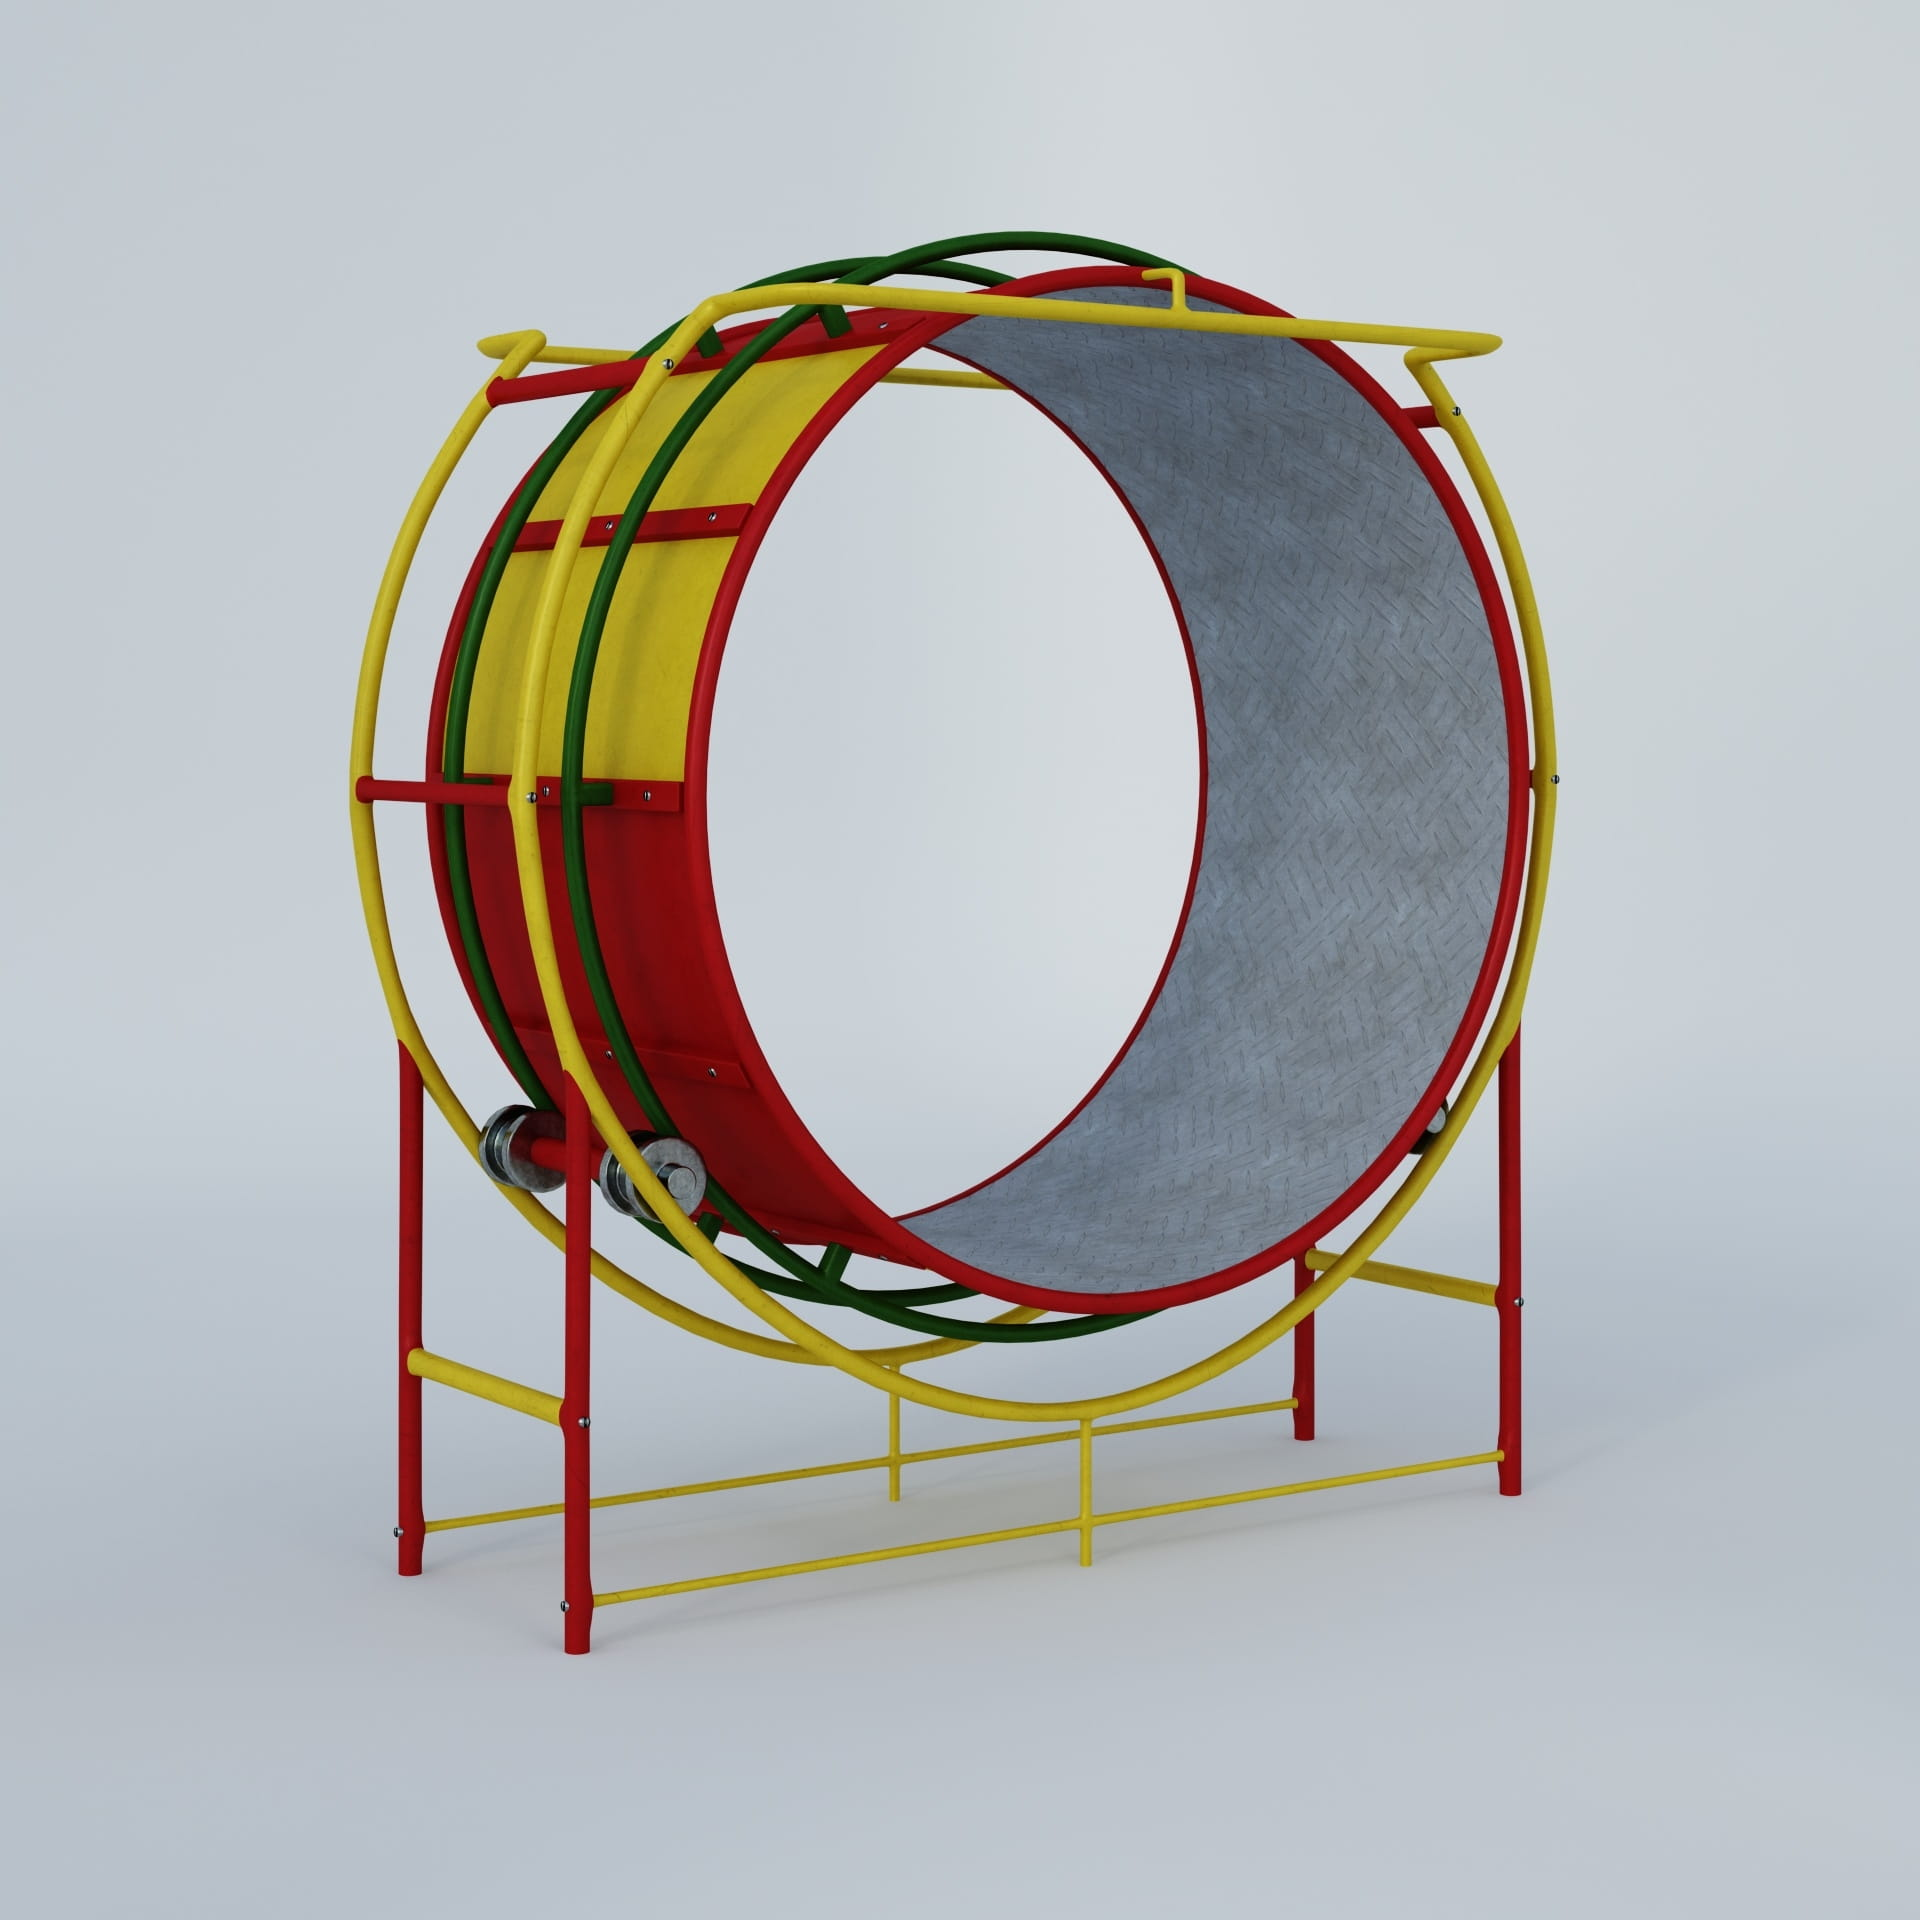 playground equipment 35 AM244 Archmodels